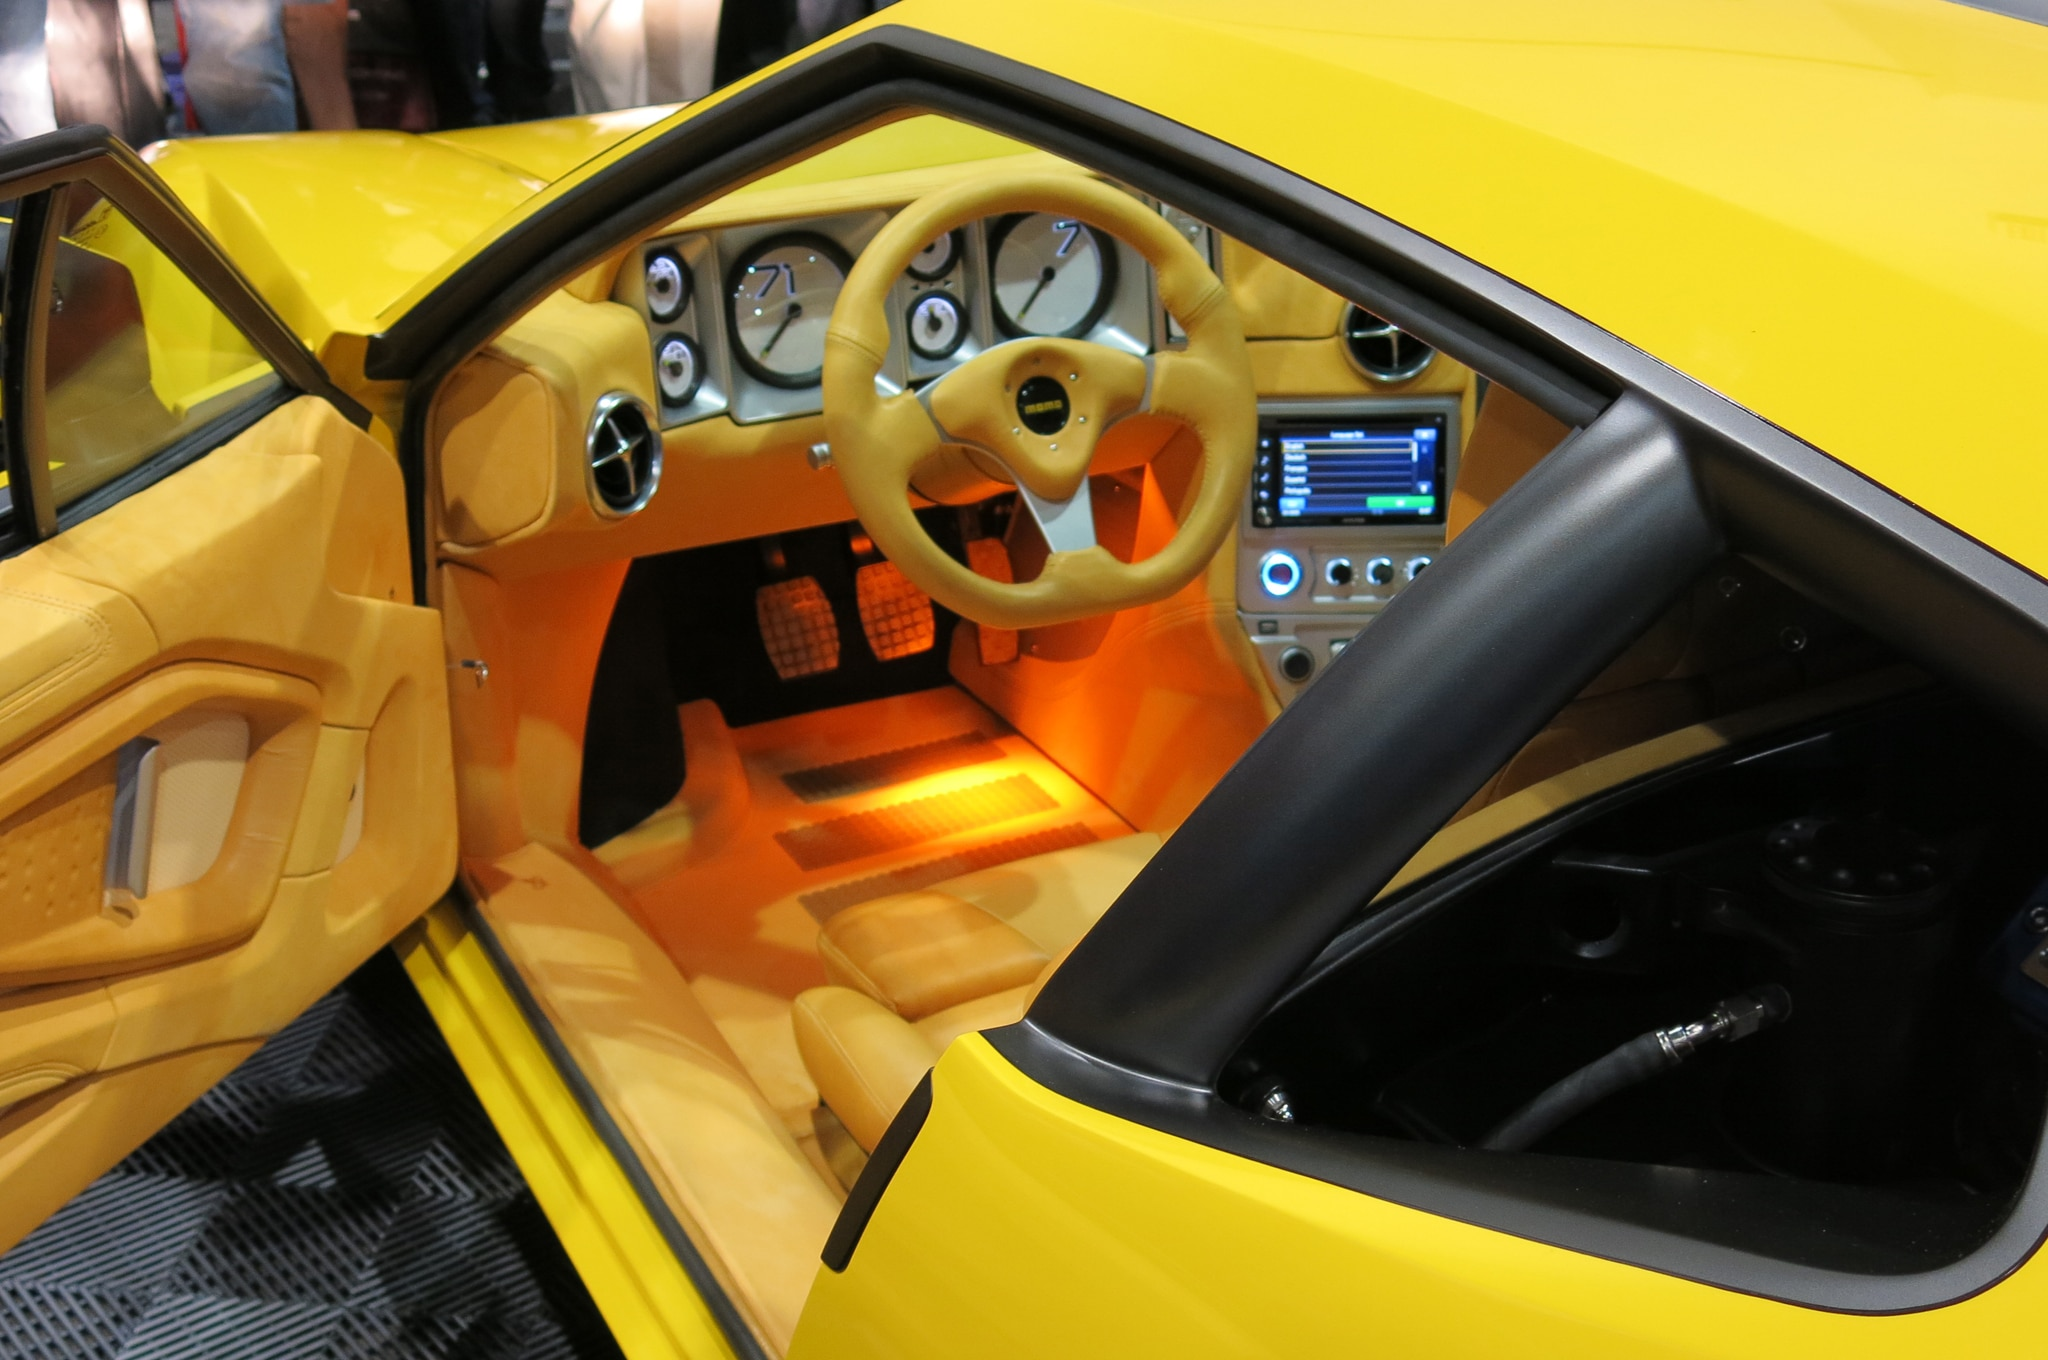 SEMA 2013 1971 DeTomaso Pantera Rebuilt With Chevrolet LS3 Power